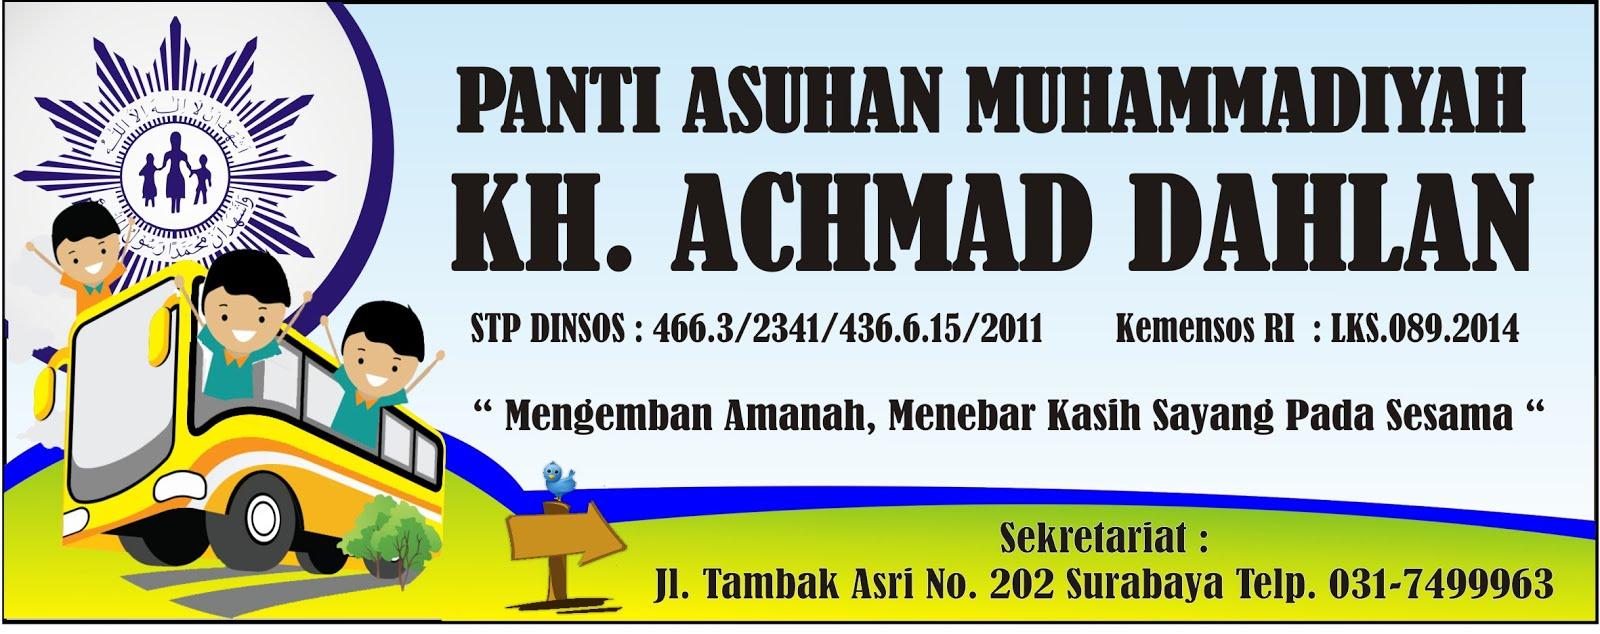 Panti Asuhan Muhammadiyah KH. Achmad Dahlan